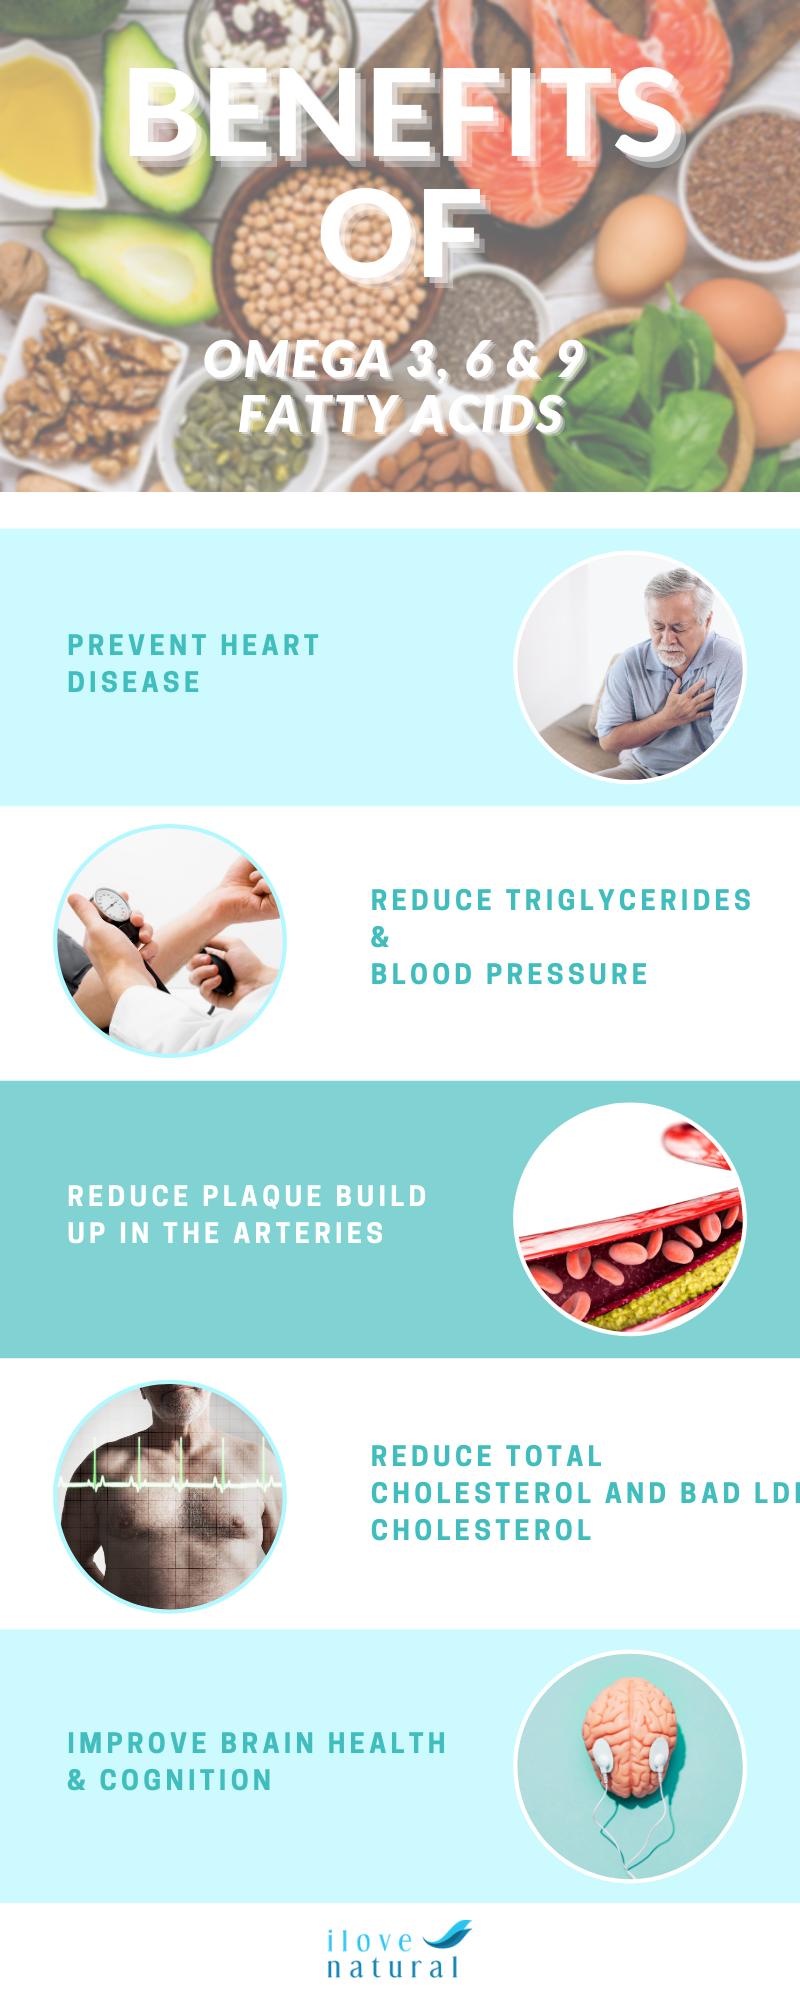 Benefits of Omega 3, 6 & 9 | ilovenatural.store